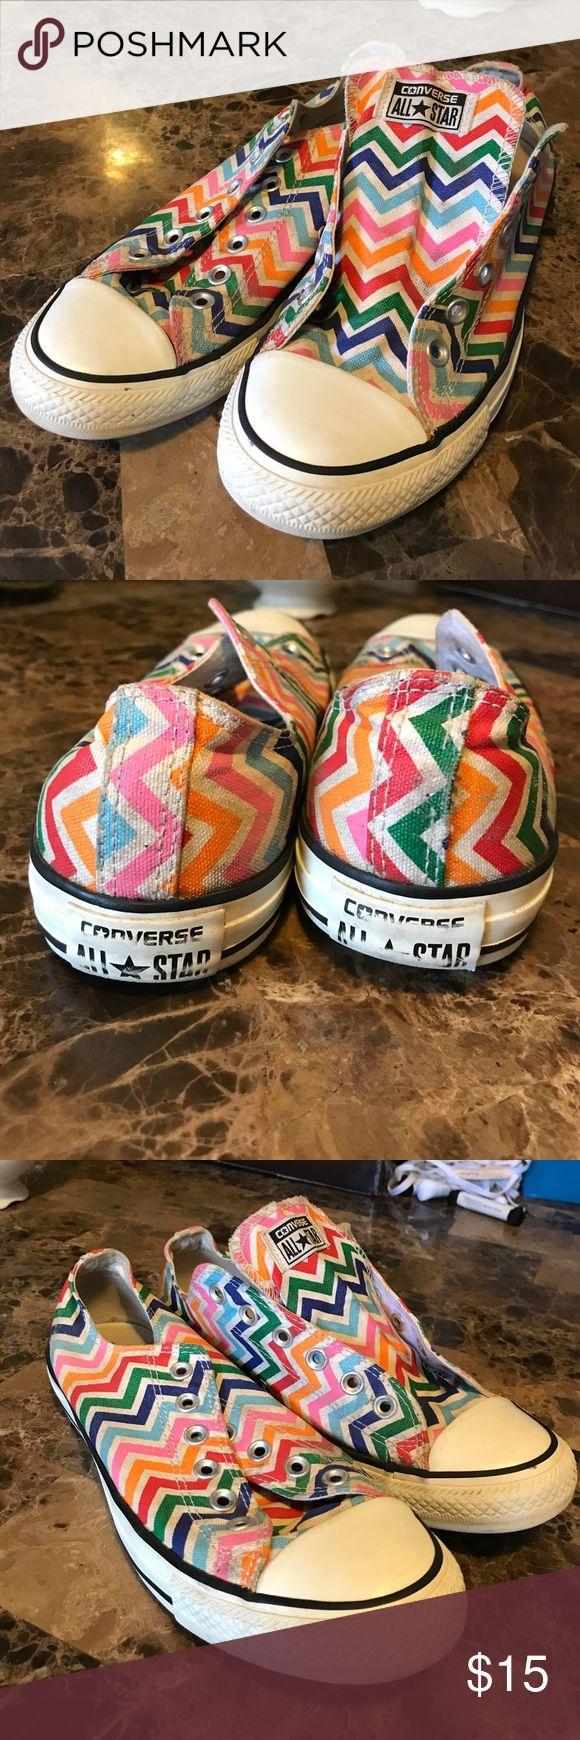 Chevron converse Rainbow chevron chuck Taylors. Men's size 8 women's size 10. Comes with new laces! Converse Shoes Athletic Shoes